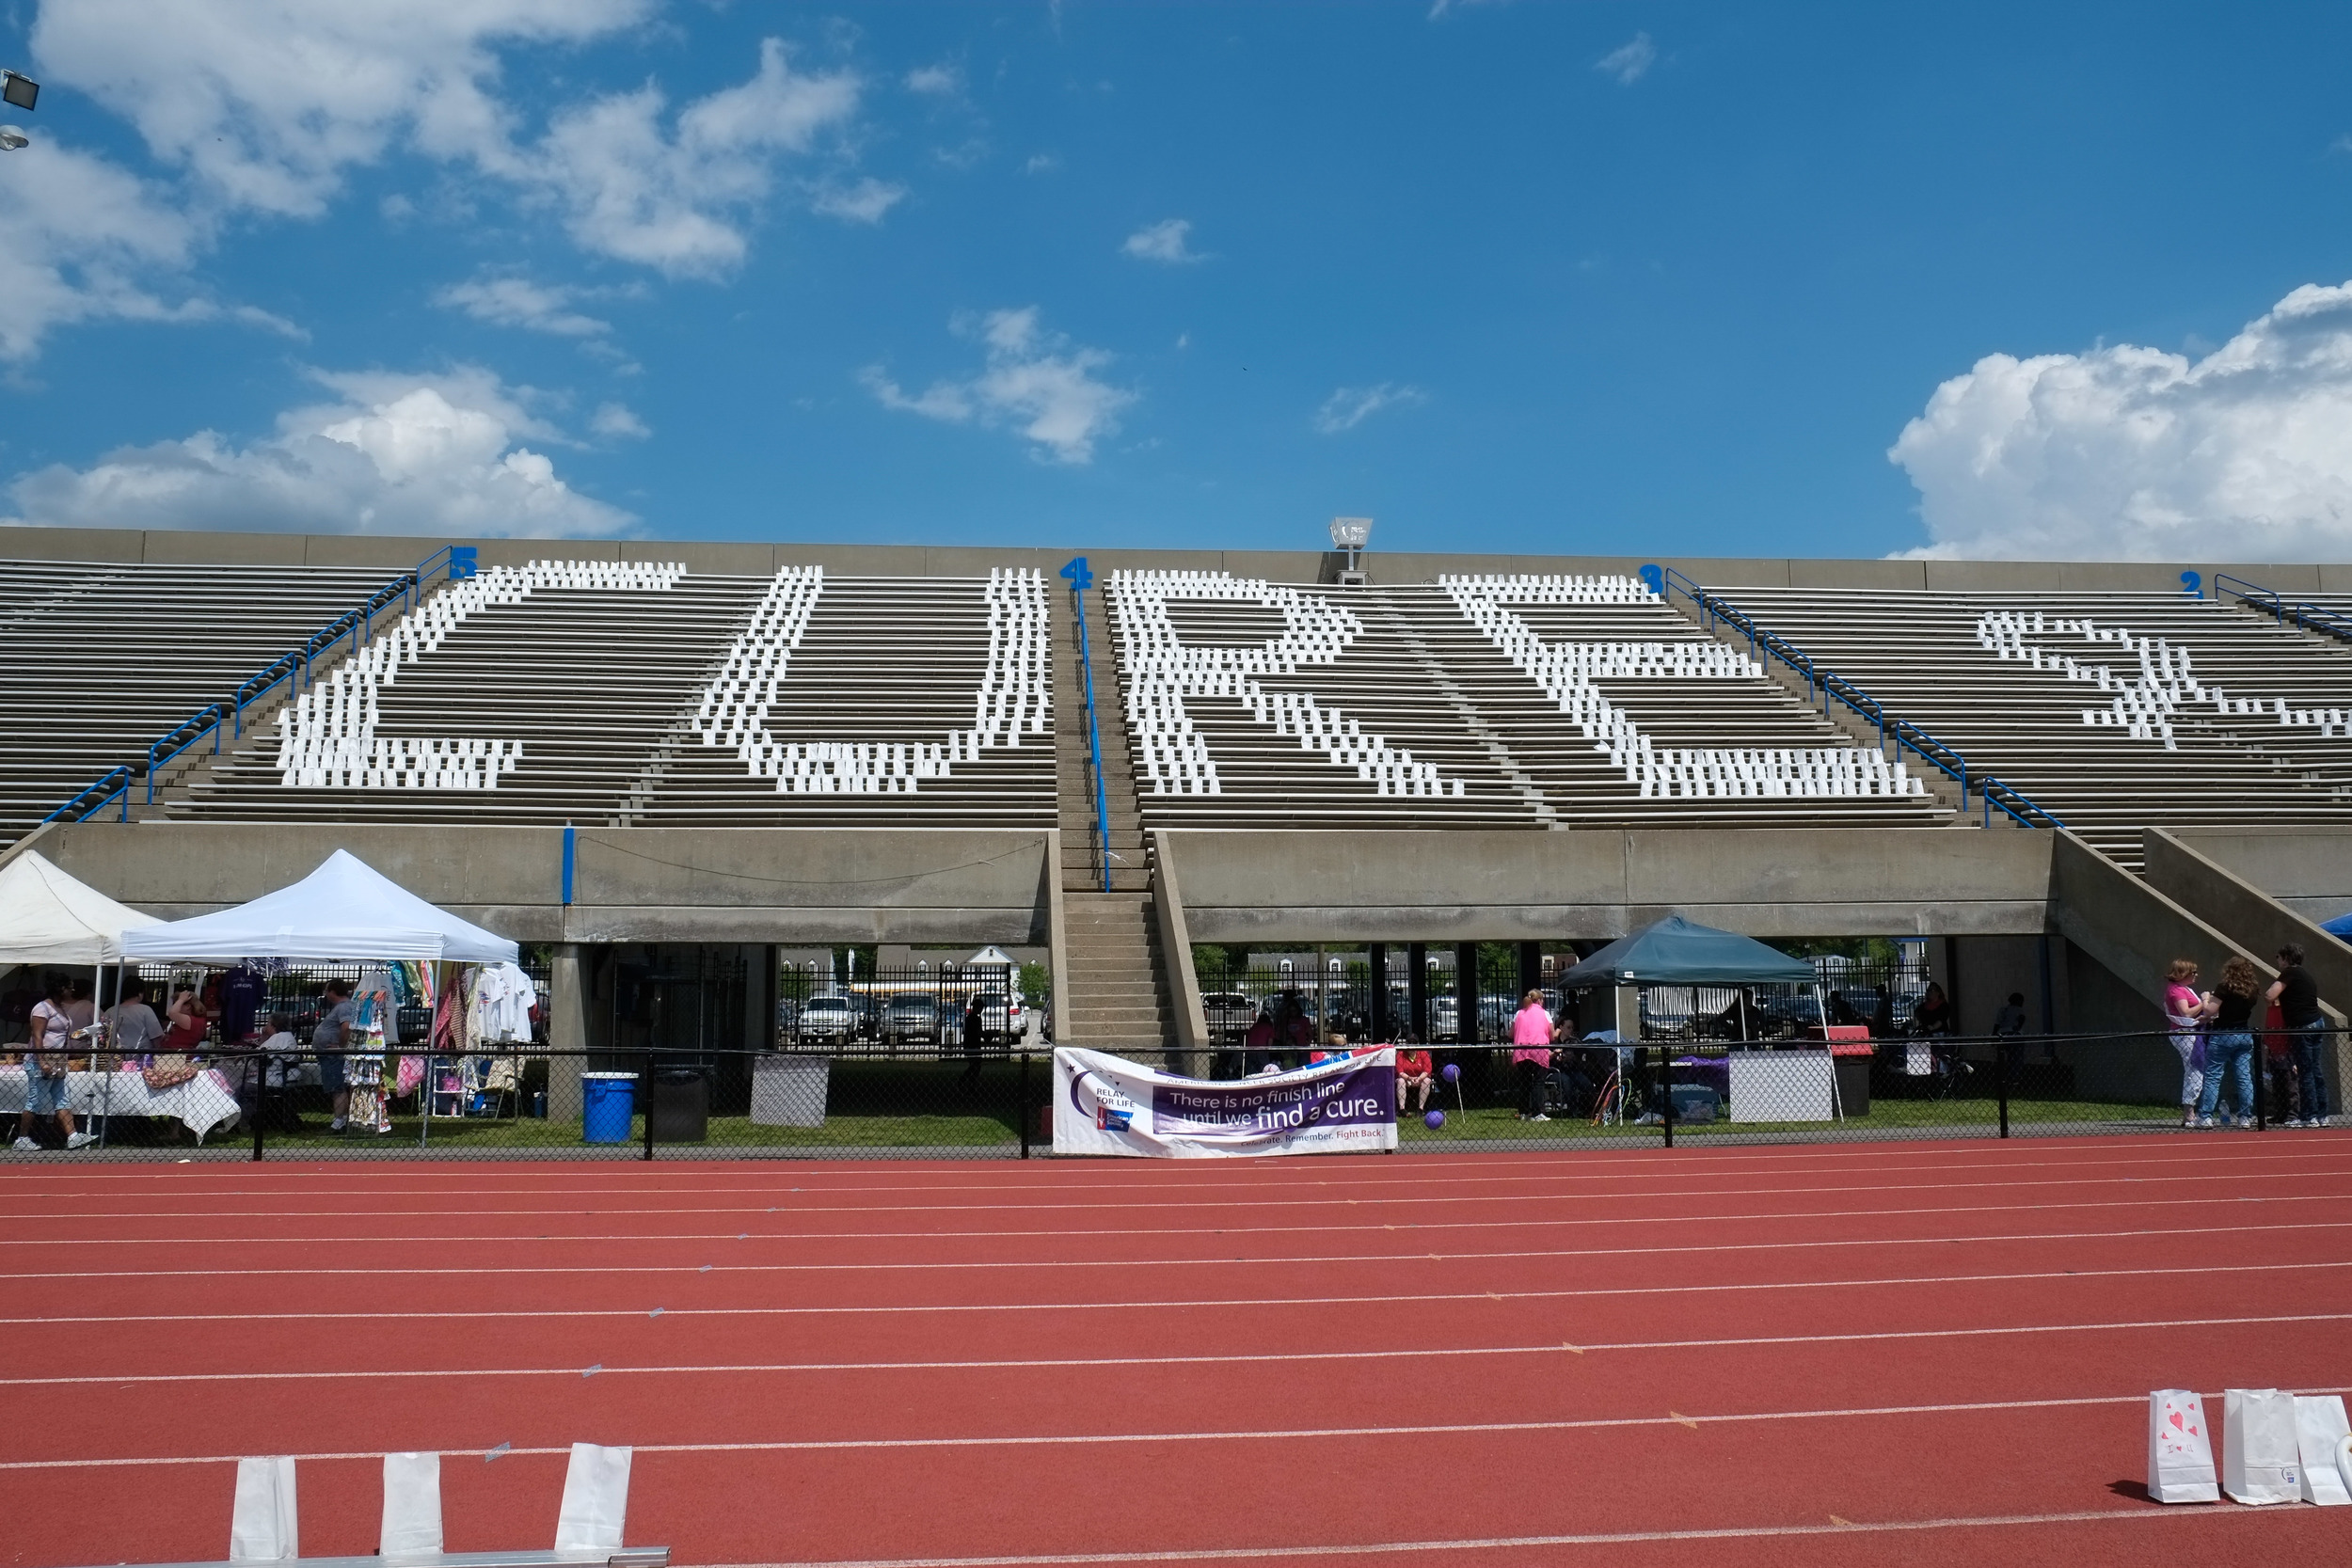 Relay for Life 2014- John B. Todd Stadium in Newport News, Virginia